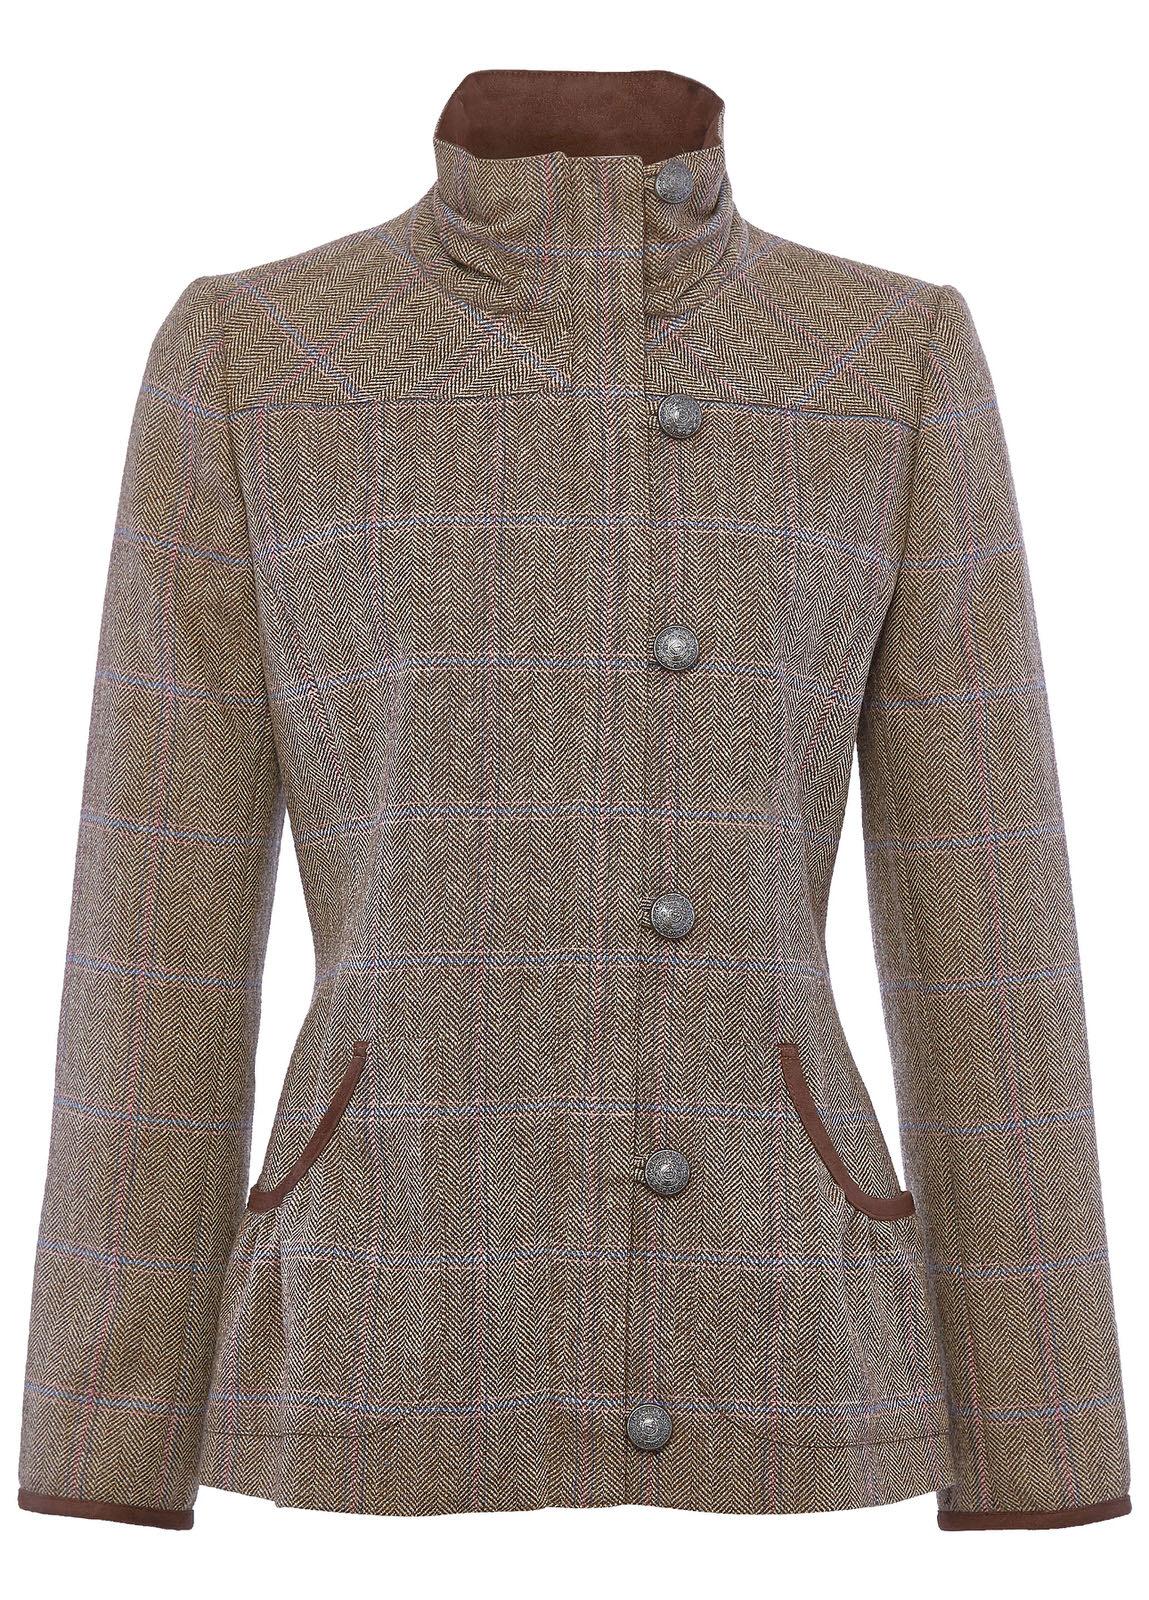 Bracken_Tweed_Coat_Woodrose_Image_1